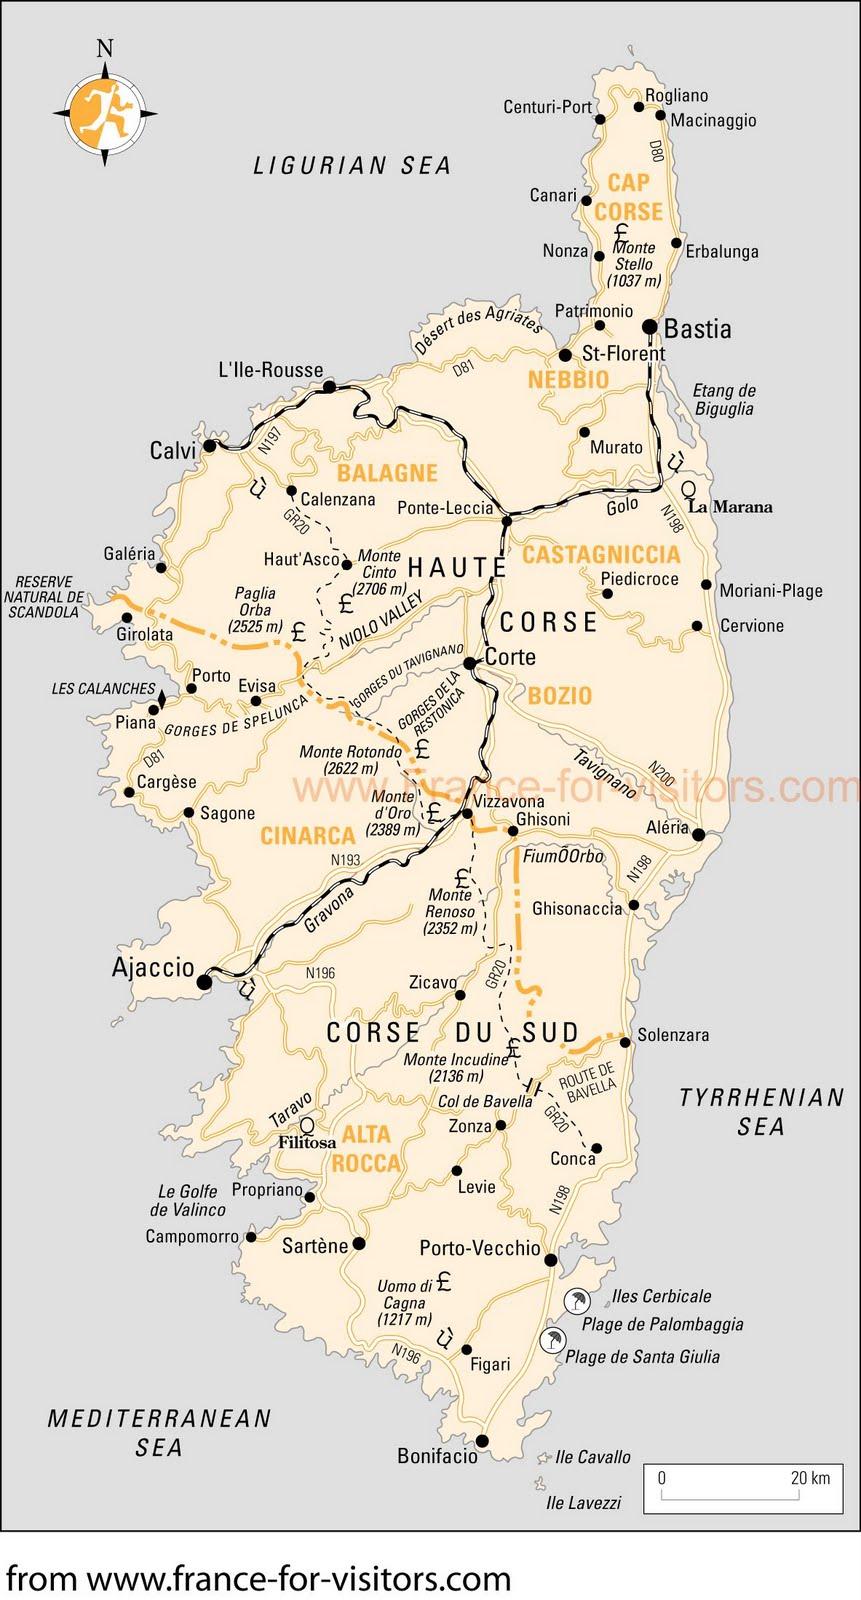 Corsica - la Corse - Korsika: Travel Information